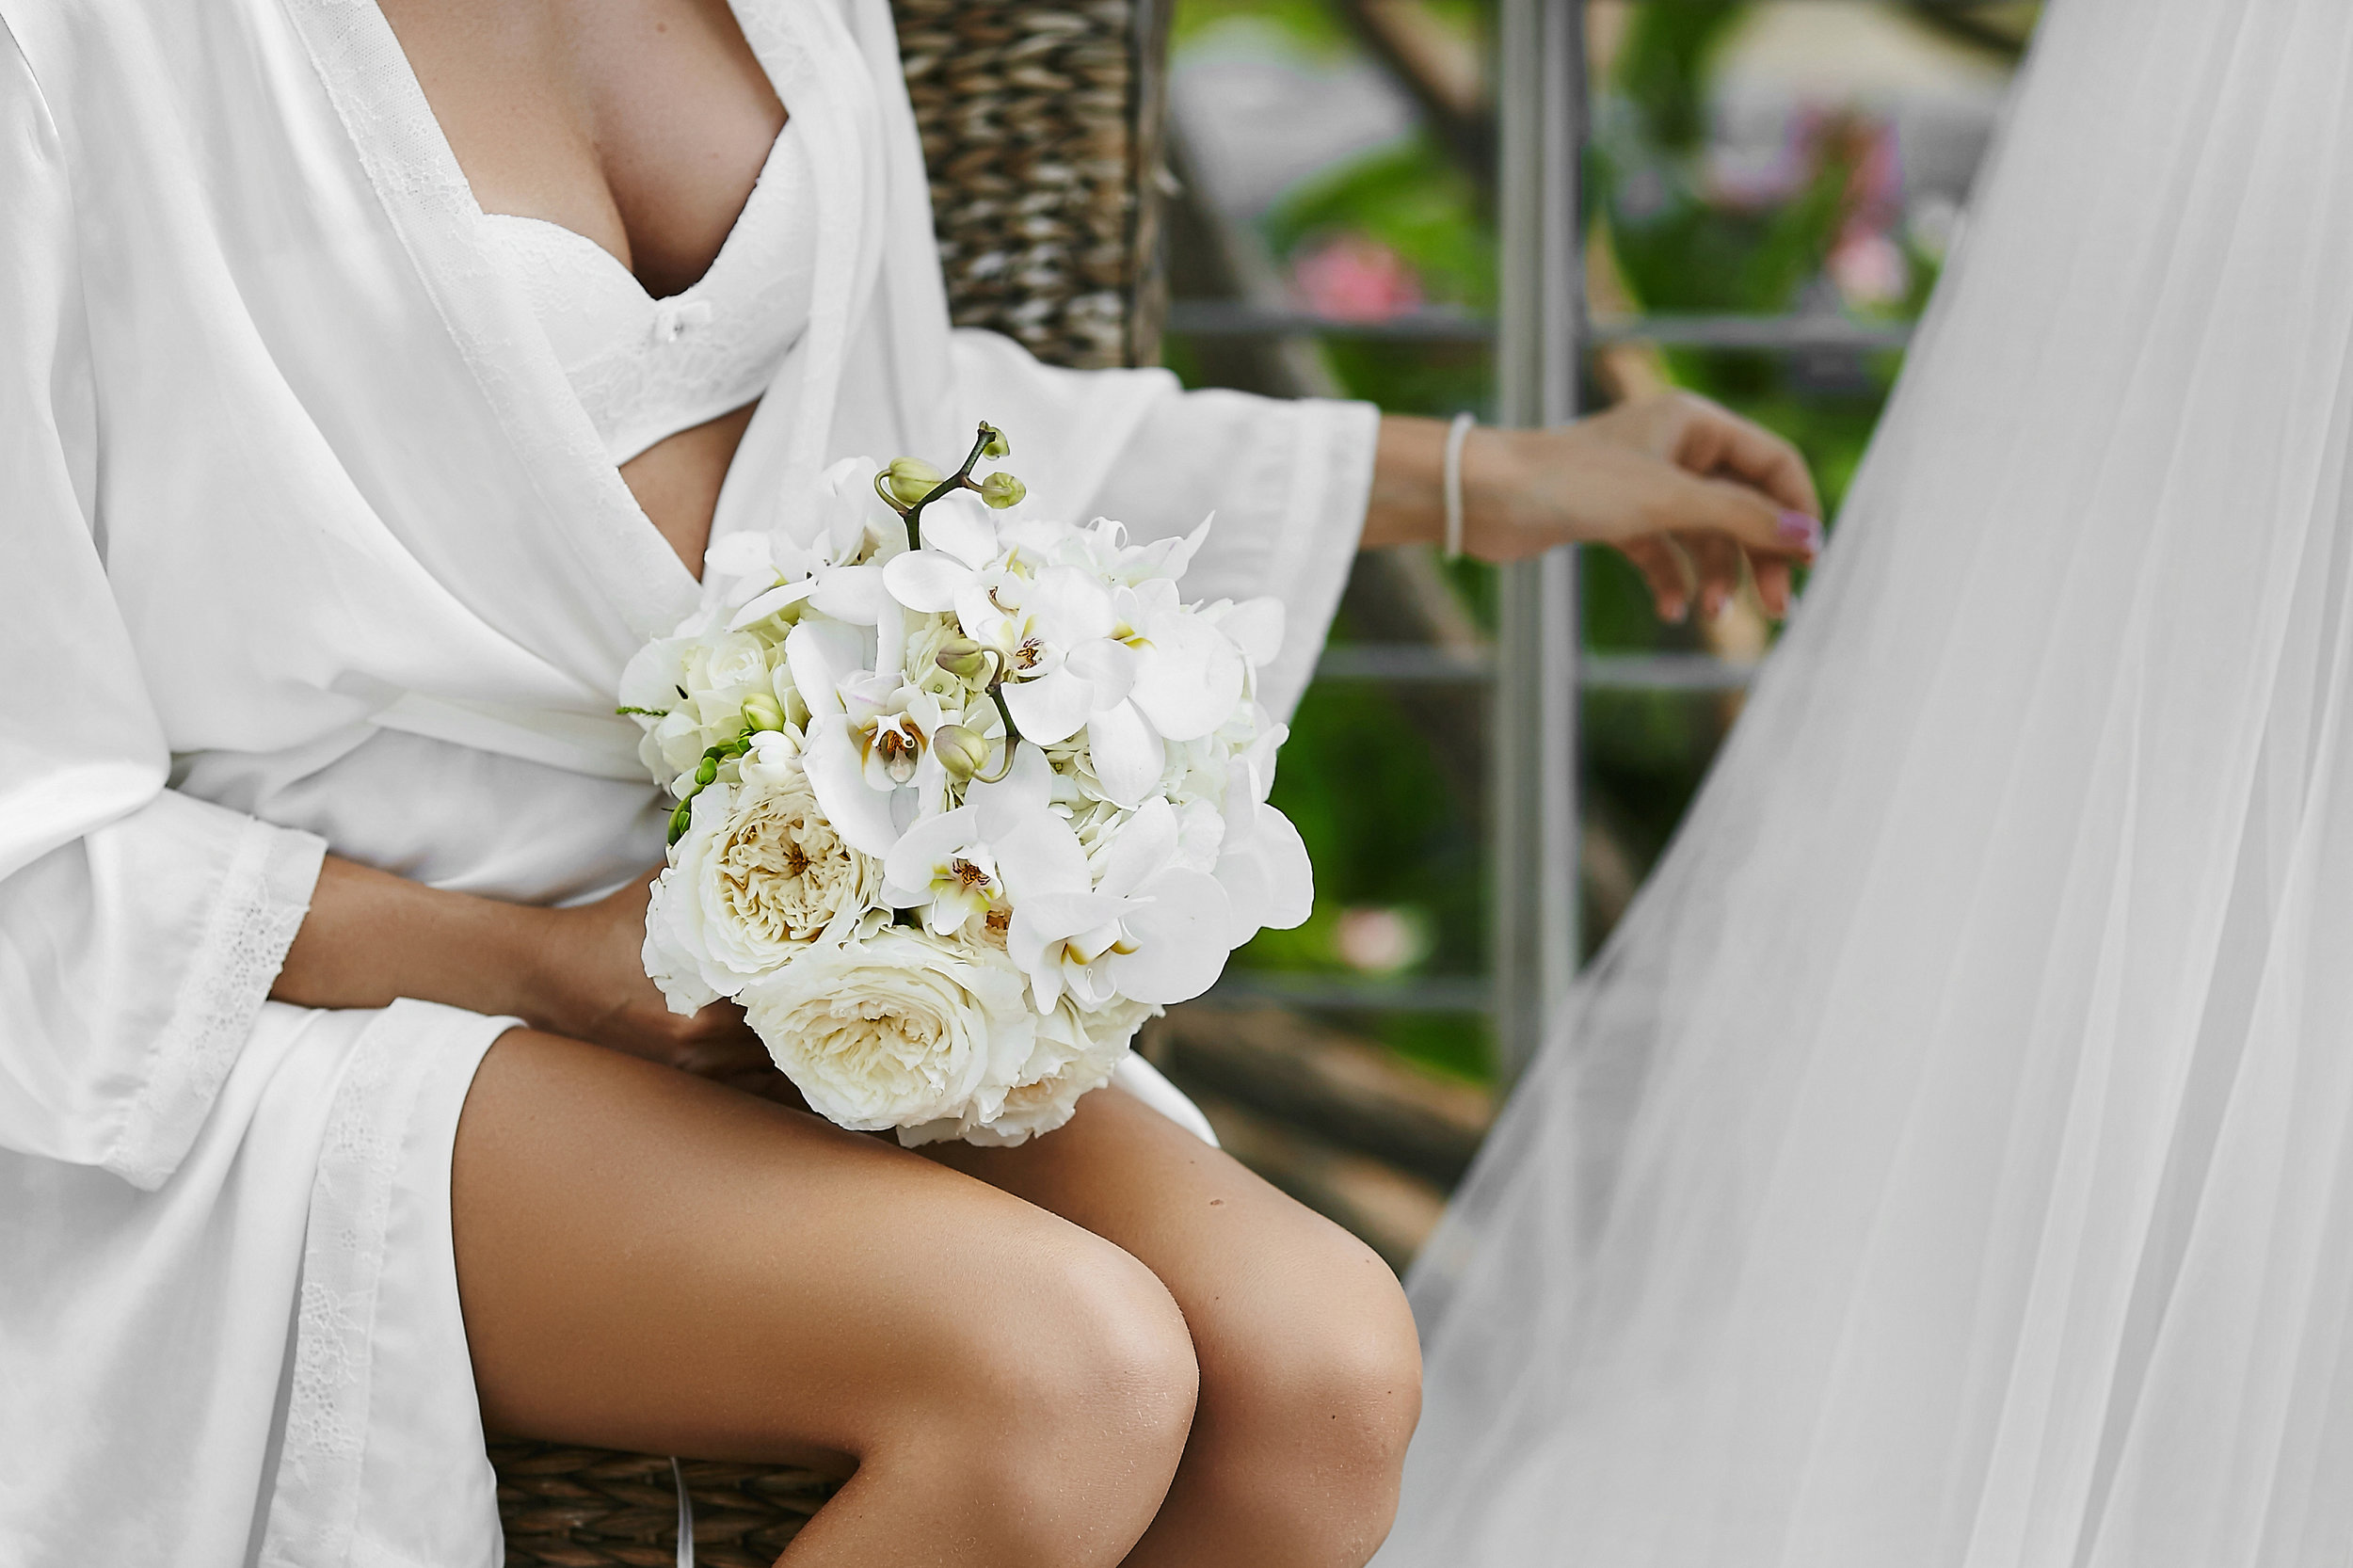 Spray tan, tan, bronzed look, elite tan, spray tan for weddings, spray tan for hens, spray tan for parties